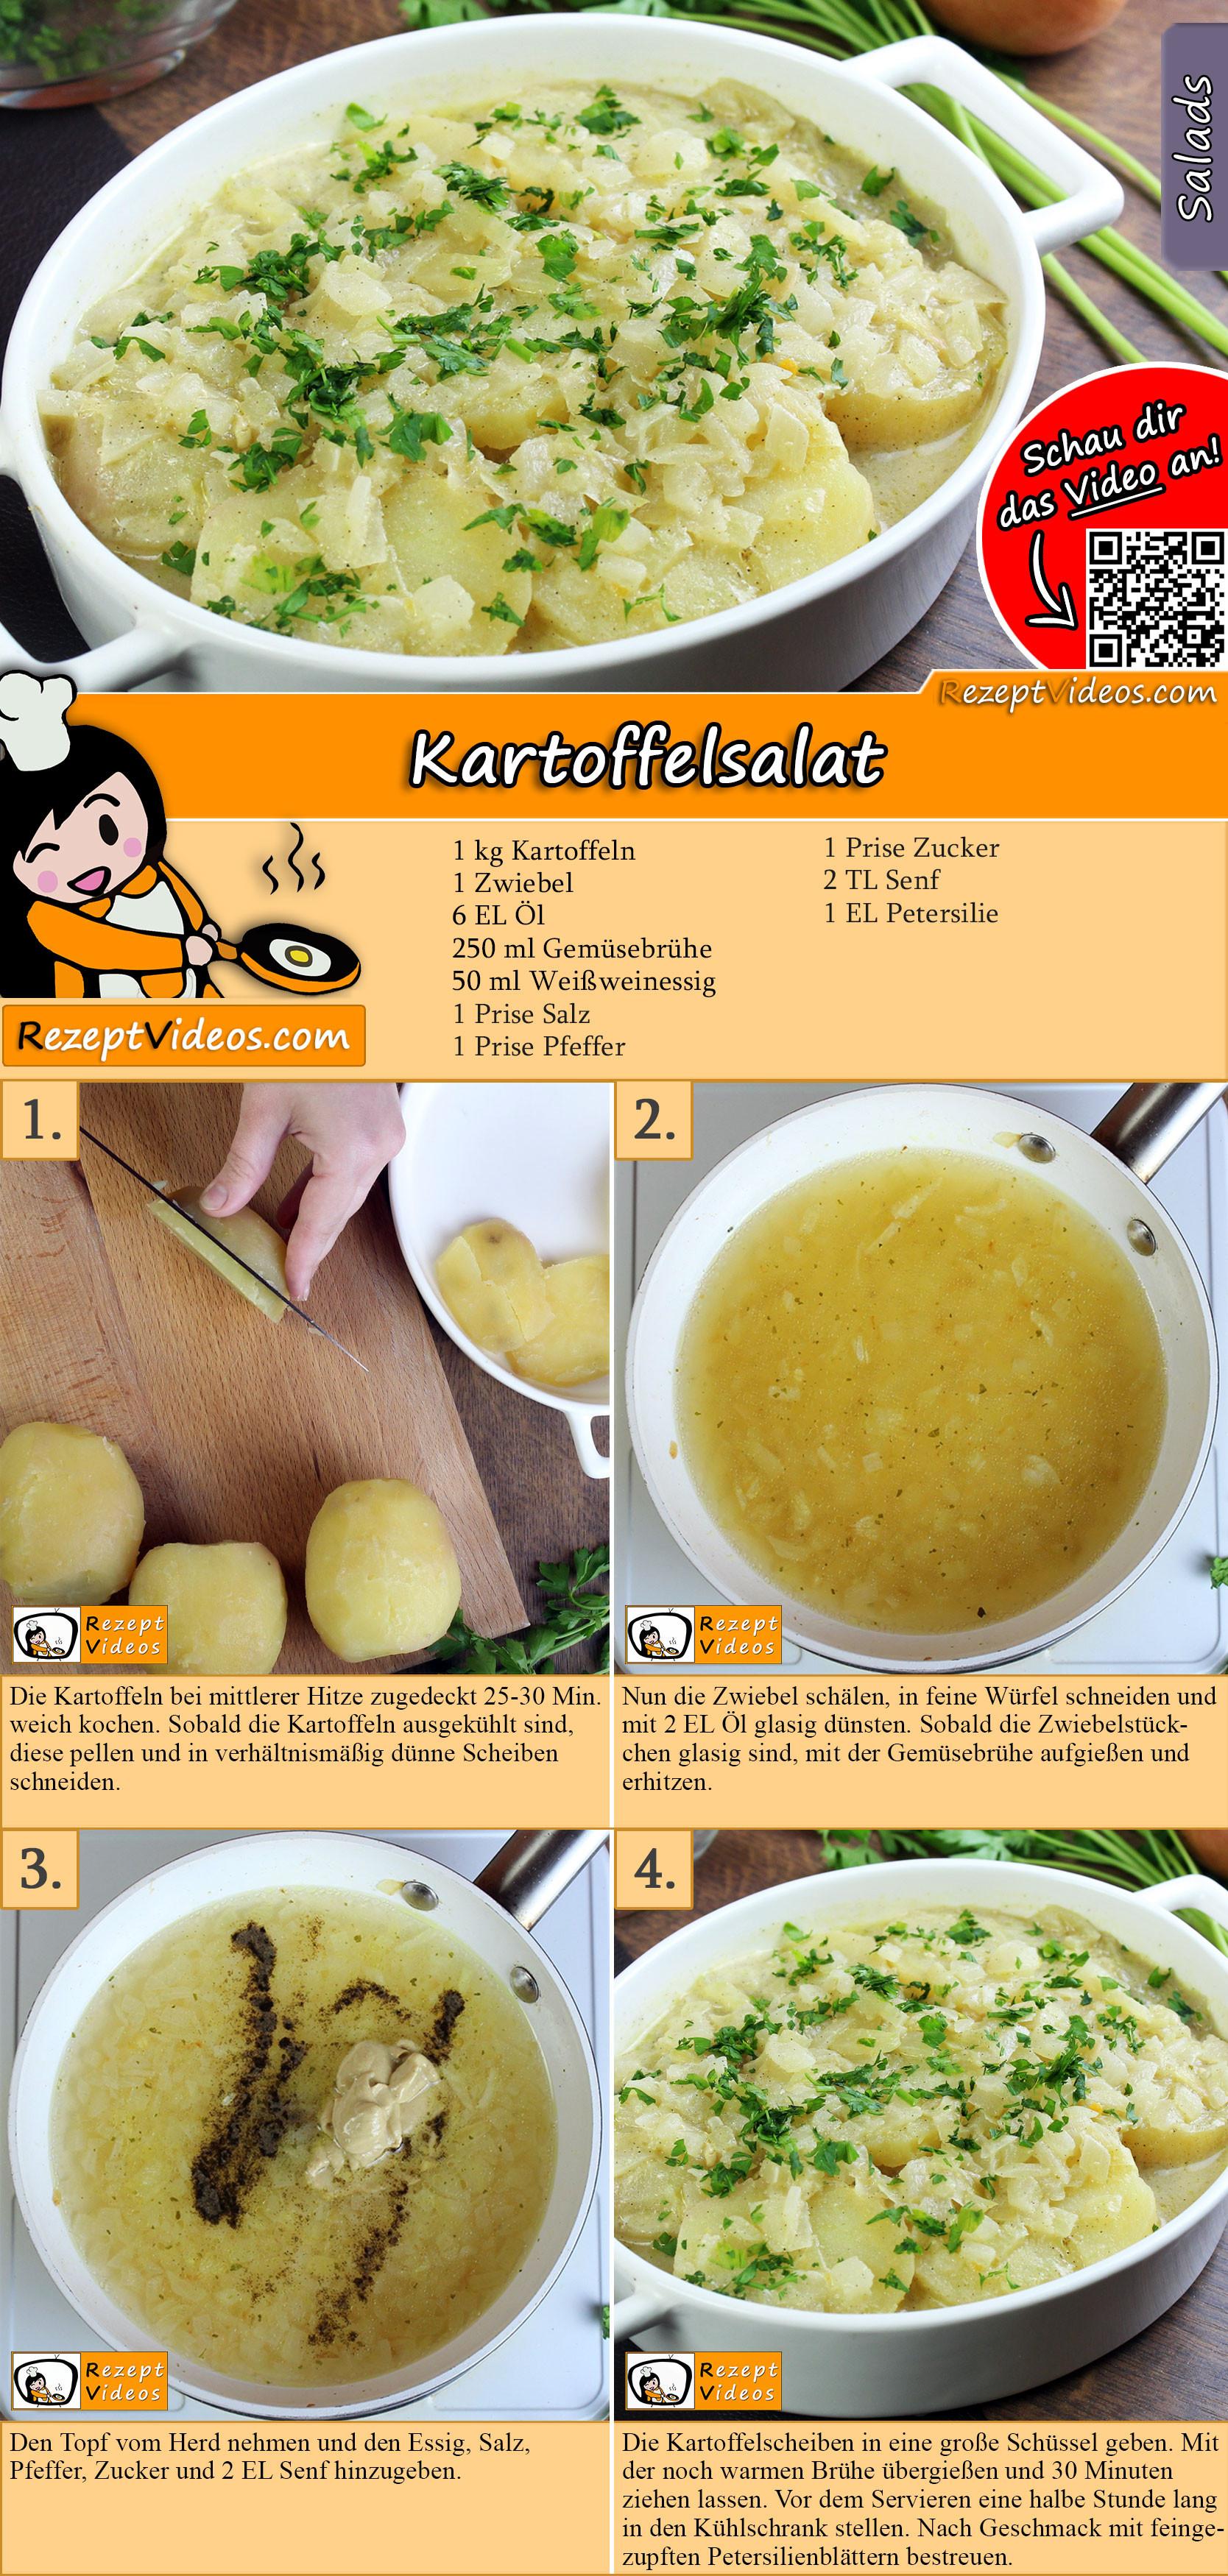 Kartoffelsalat Rezept mit Video